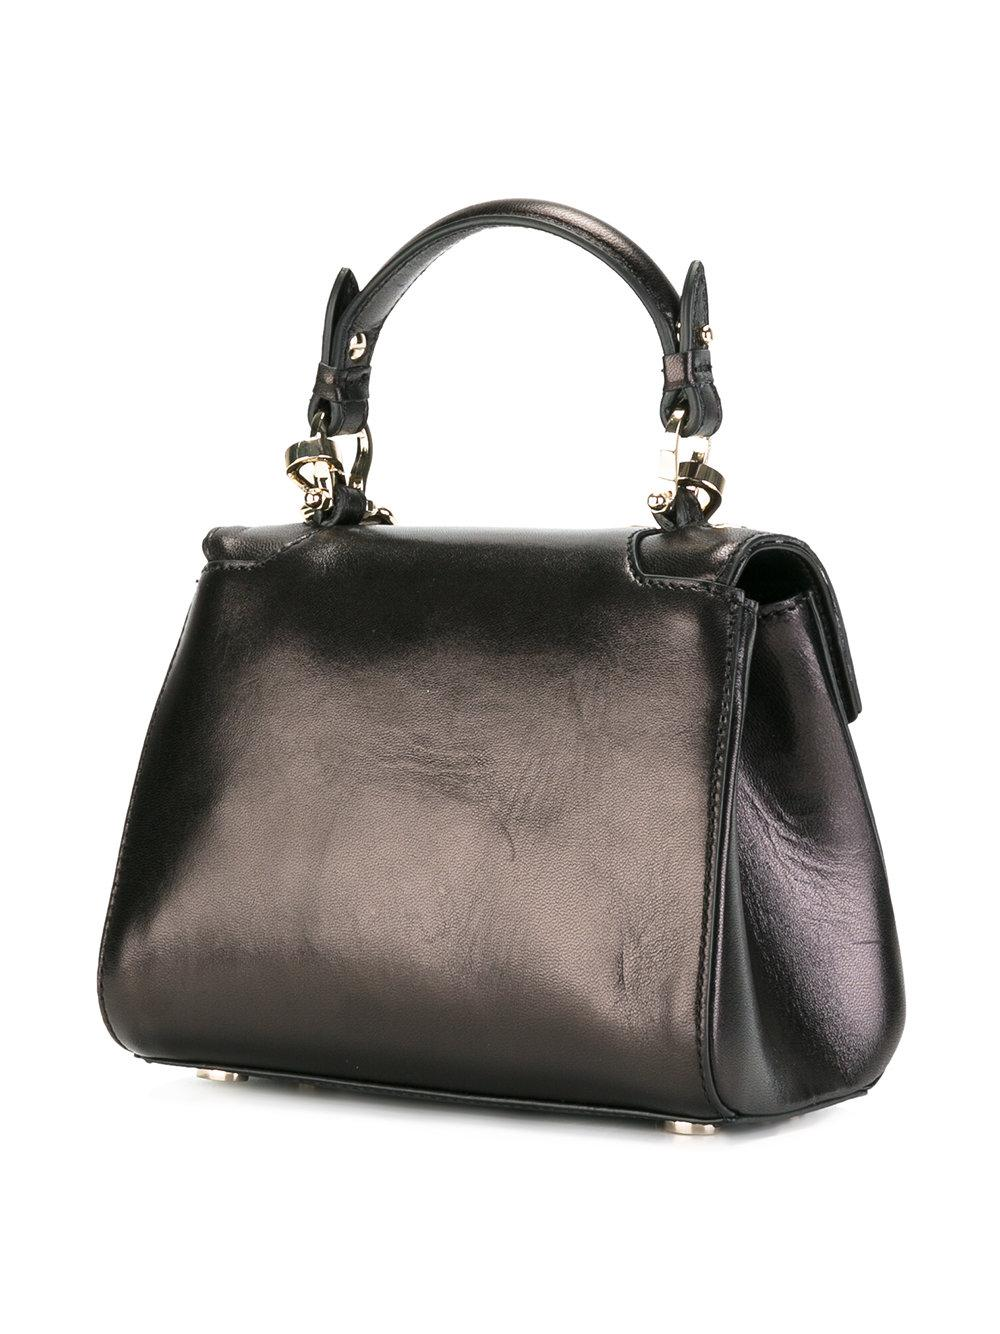 Hampstead Pre Owned >> Lyst - Trussardi Mini Lovy Bag in Brown